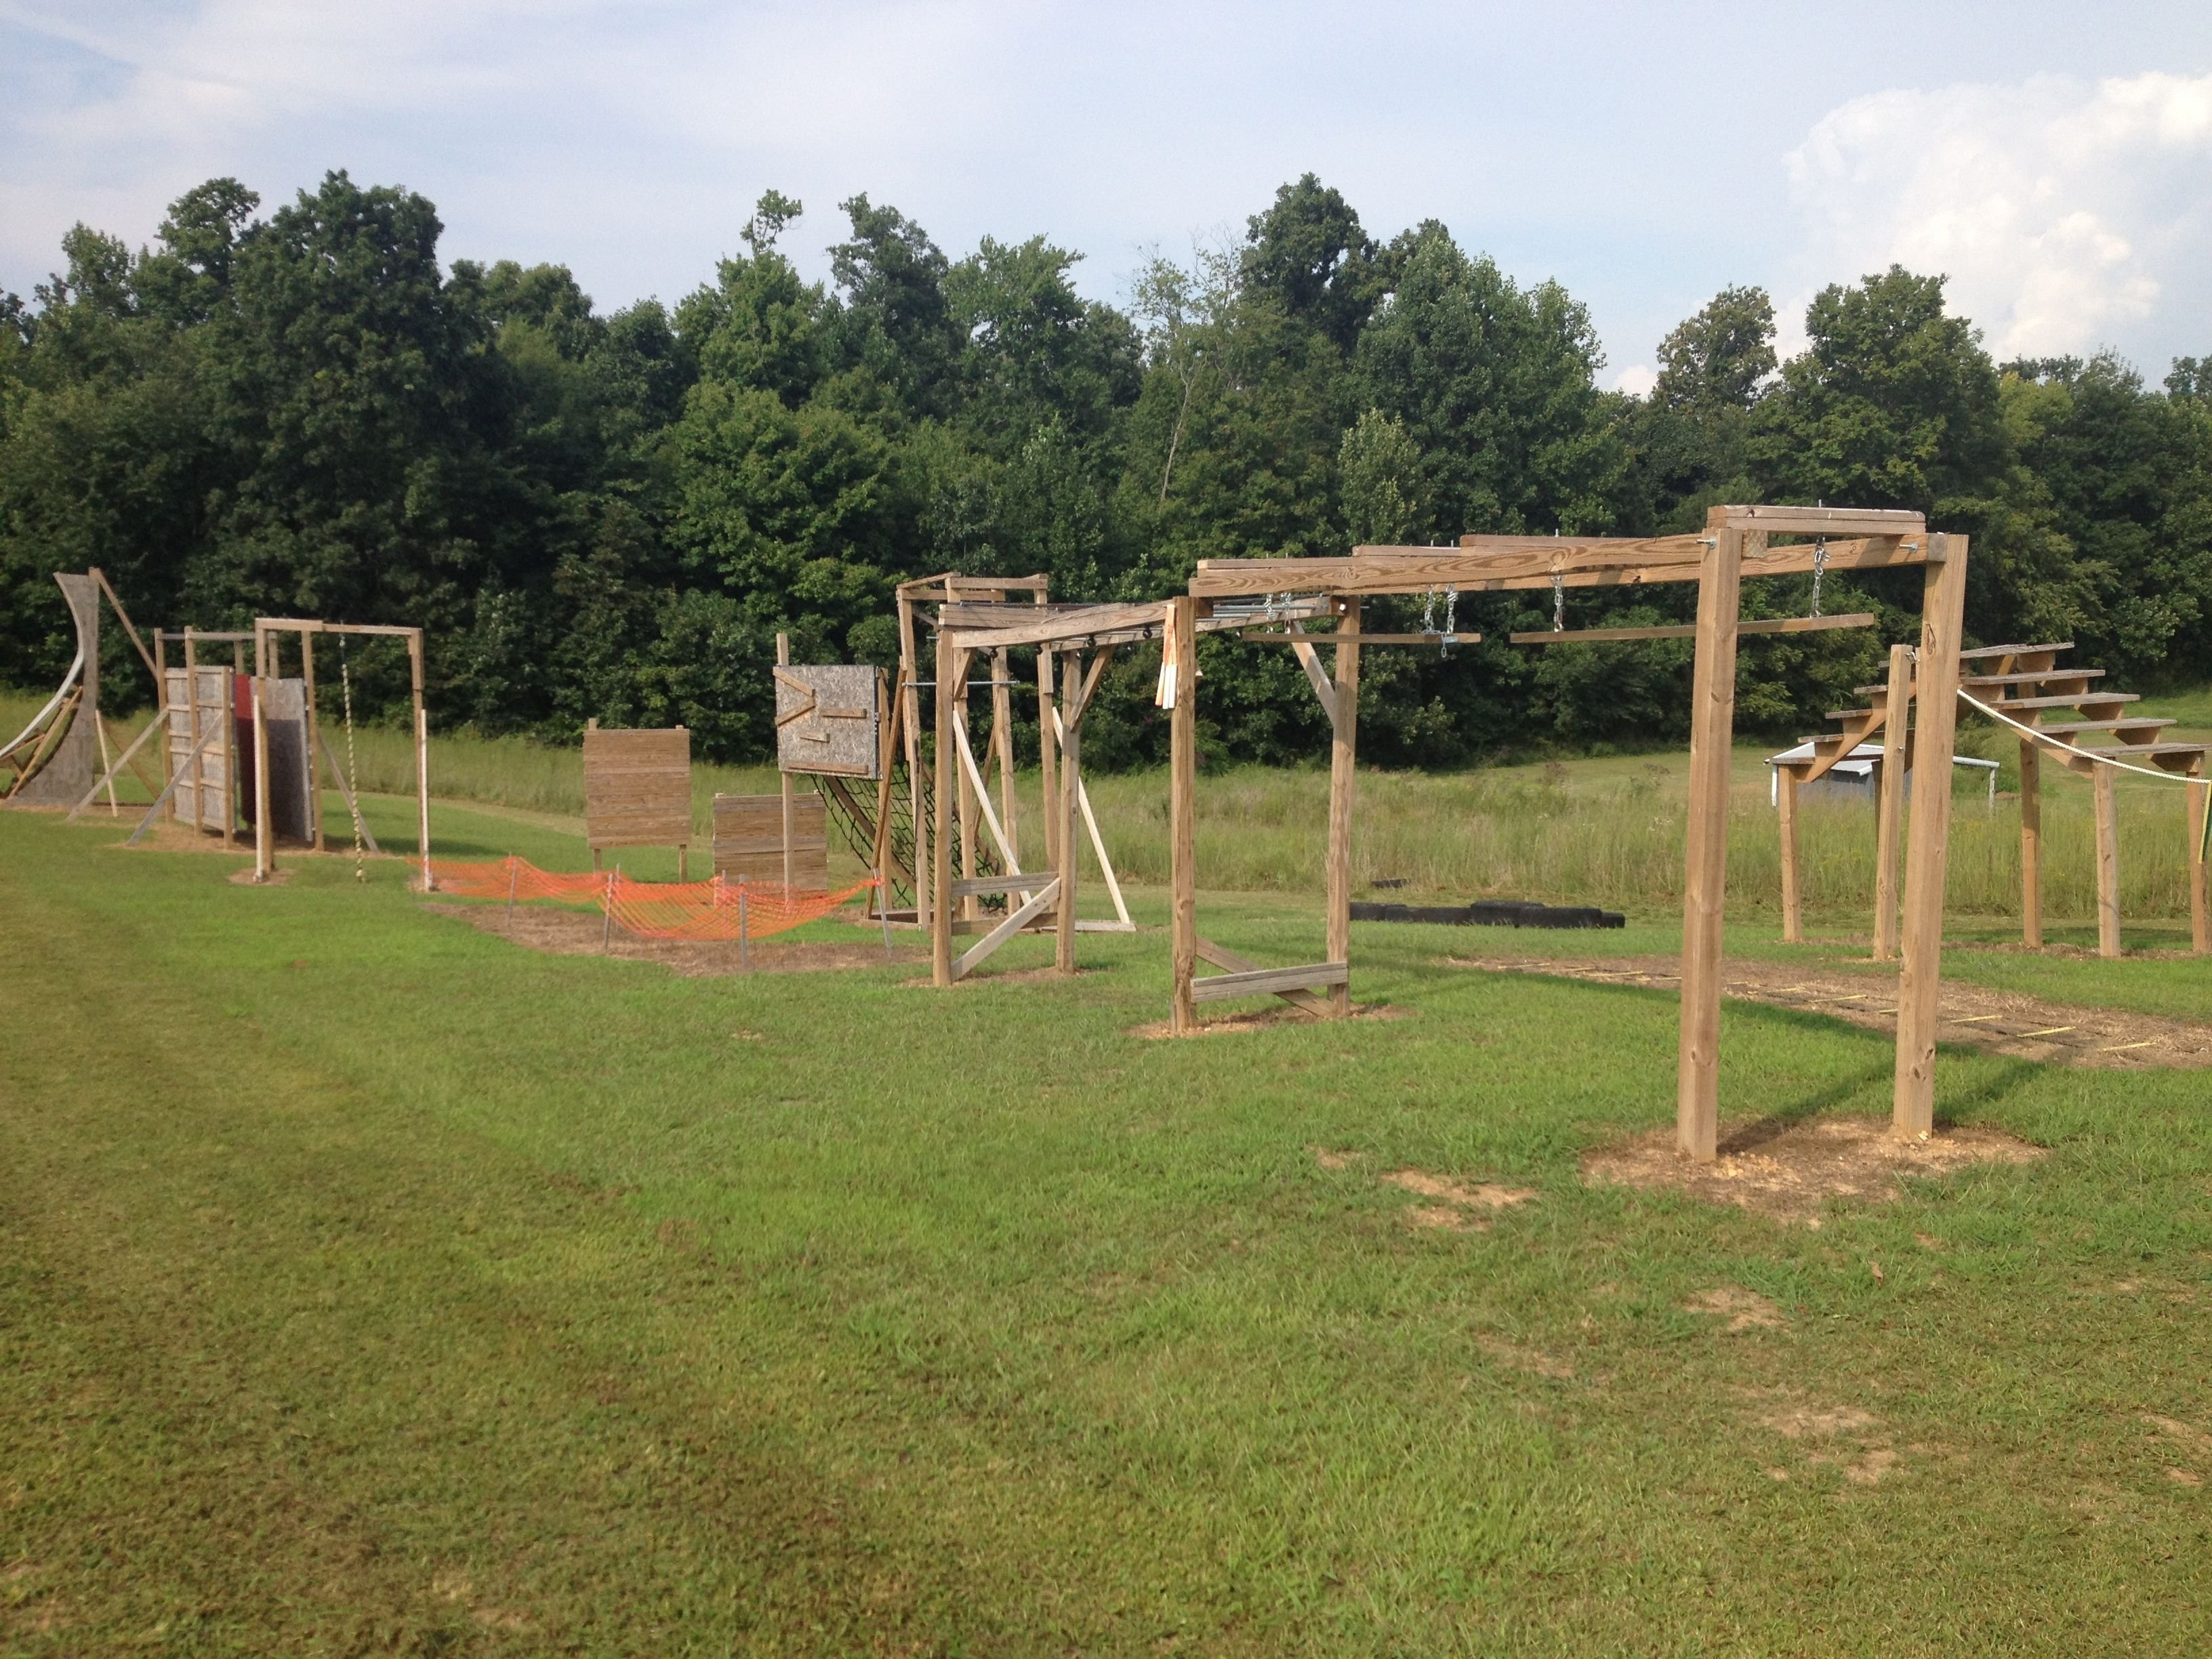 diy backyard obstacle course - yahoo search results | american ninja